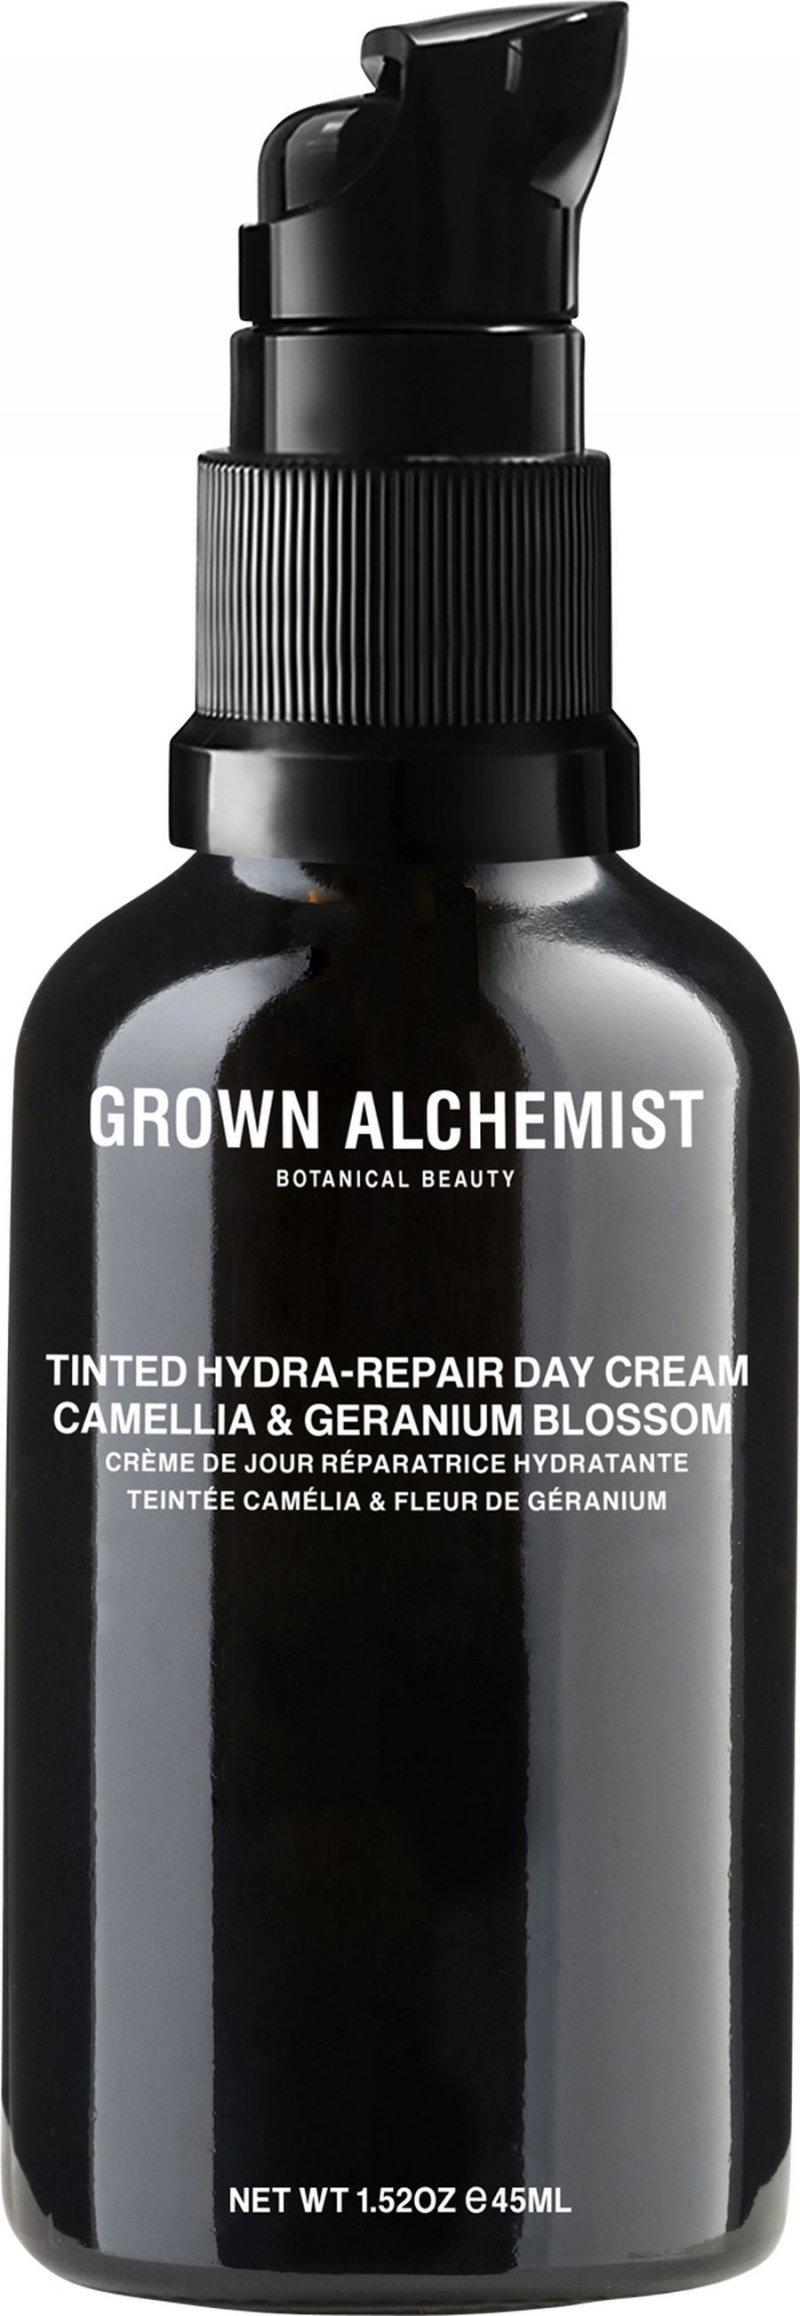 Image of   Grown Alchemist Ansigtscreme - Tinted Hydra-repair Day Cream - 45 Ml